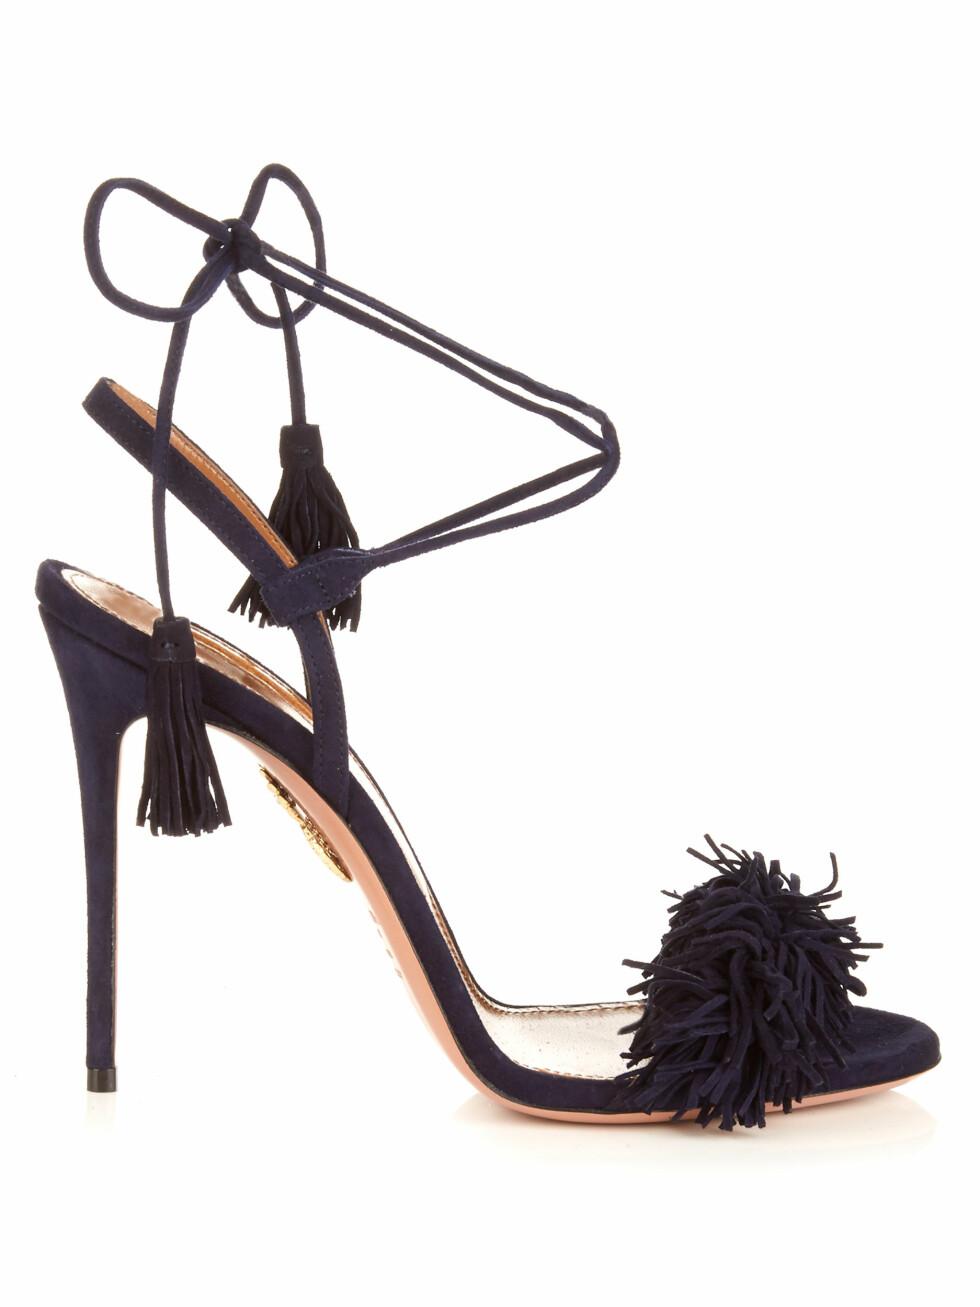 Hæler fra Aquazzura via Matchesfashion.com | kr 2600 | http://www.matchesfashion.com/intl/products/Aquazzura-Wild-Thing-suede-fringed-sandals-1052536